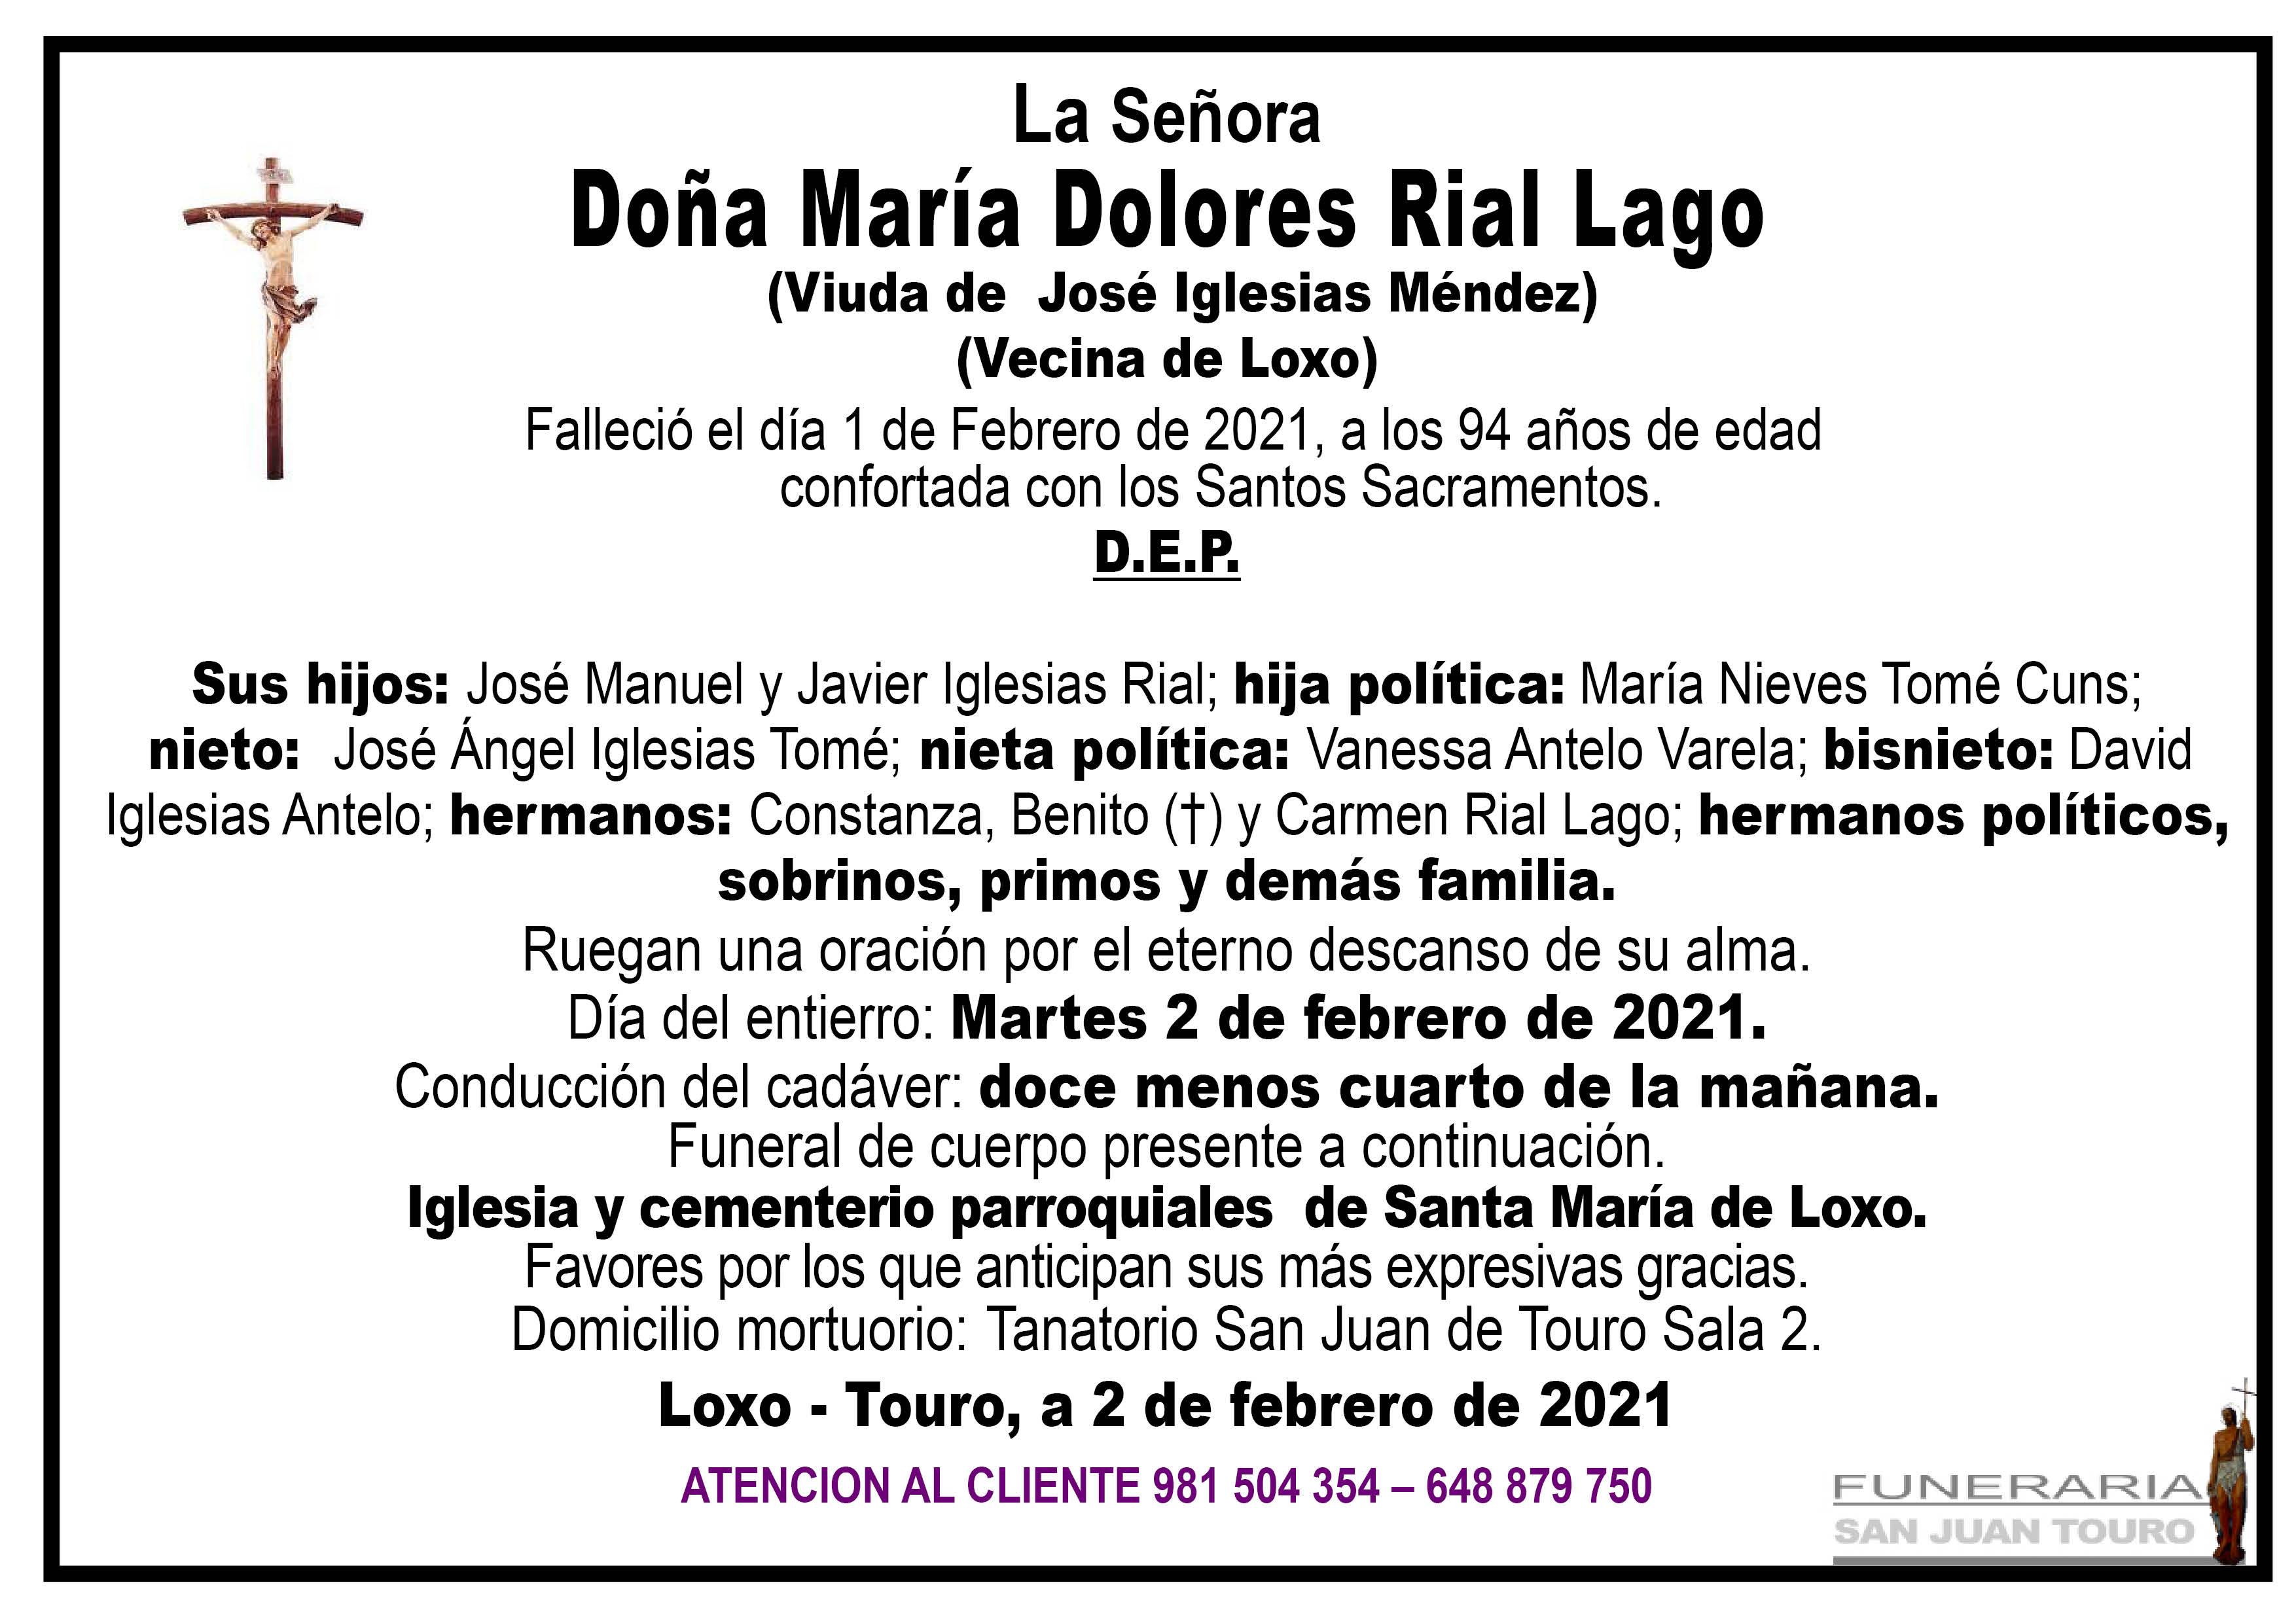 Esquela de SEPELIO DE DOÑA MARÍA DOLORES RIAL LAGO